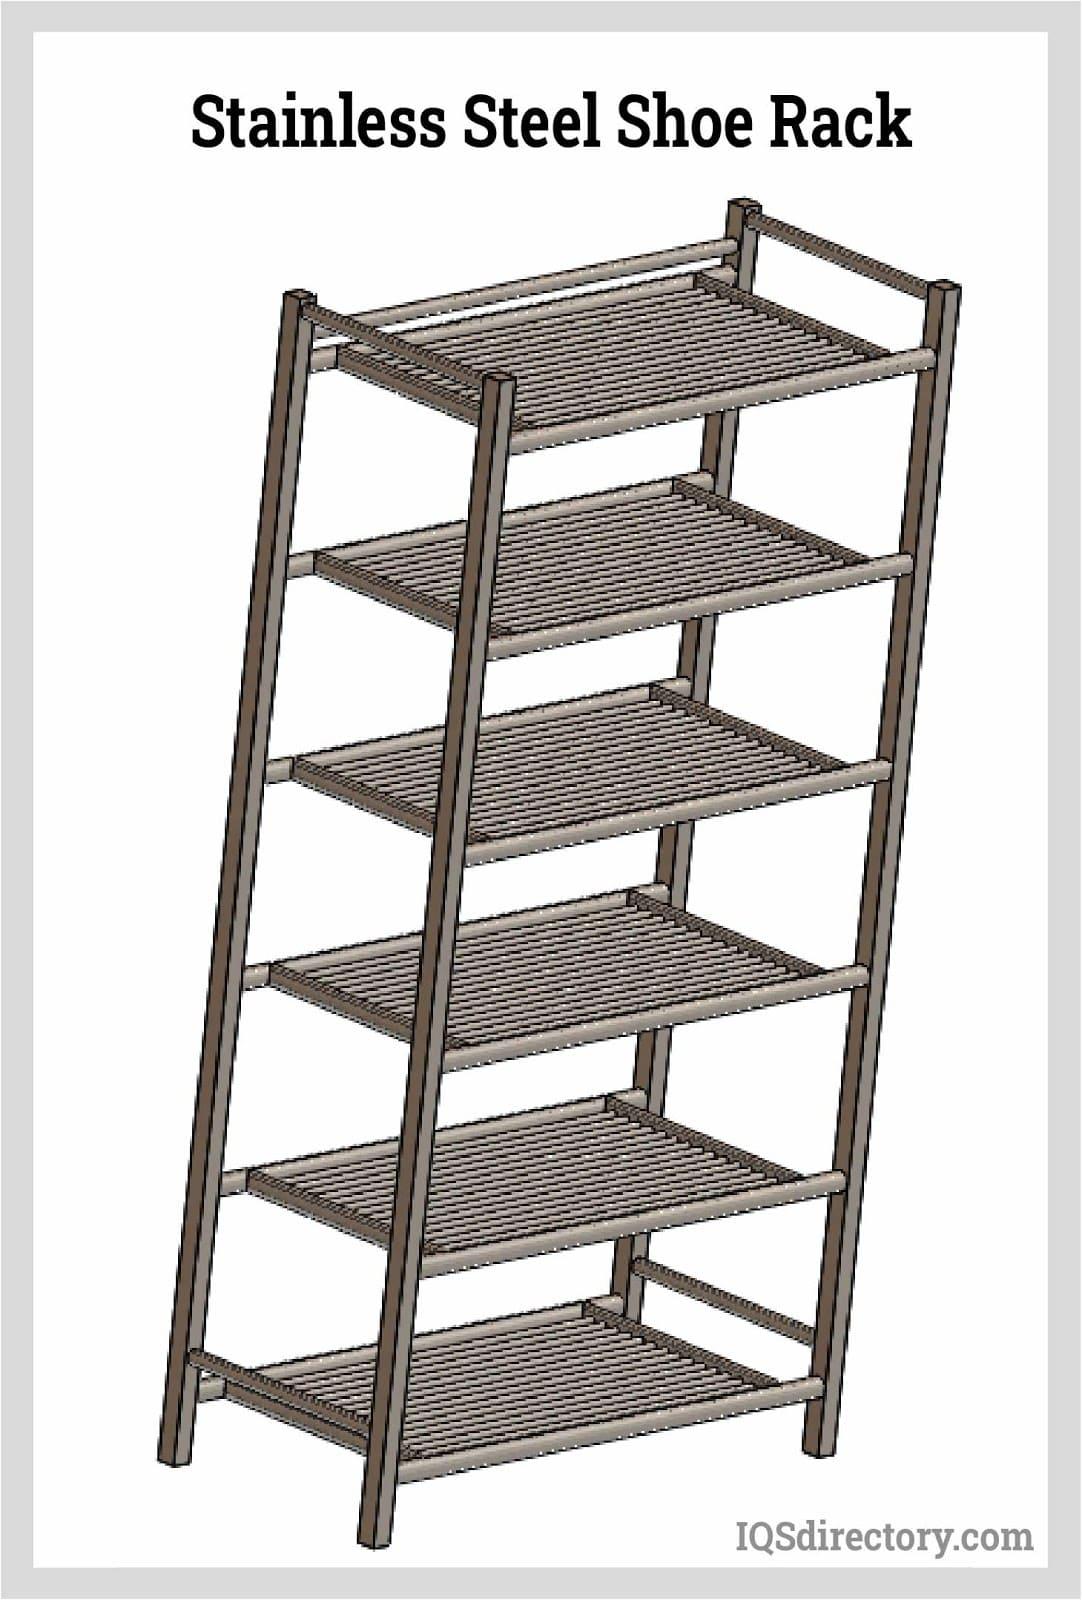 Stainless Steel Shoe Rack